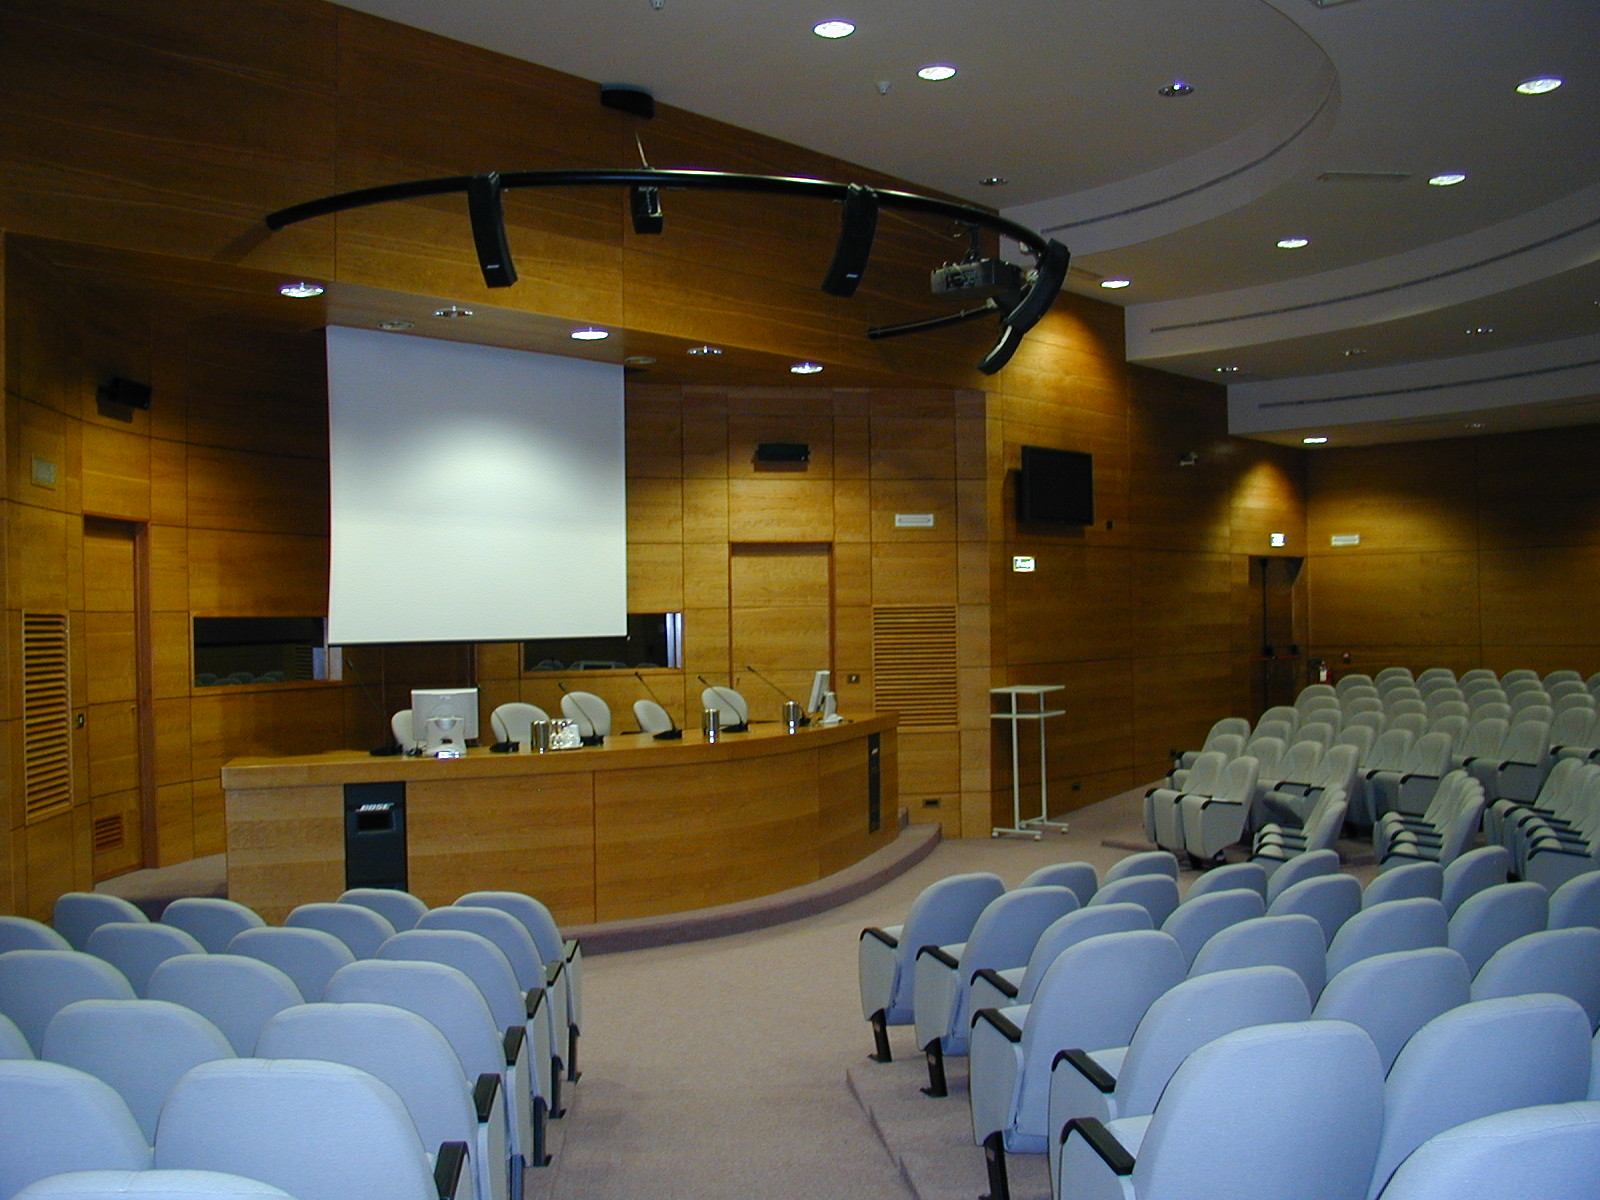 Auditorium, Ospedale di Arezzo